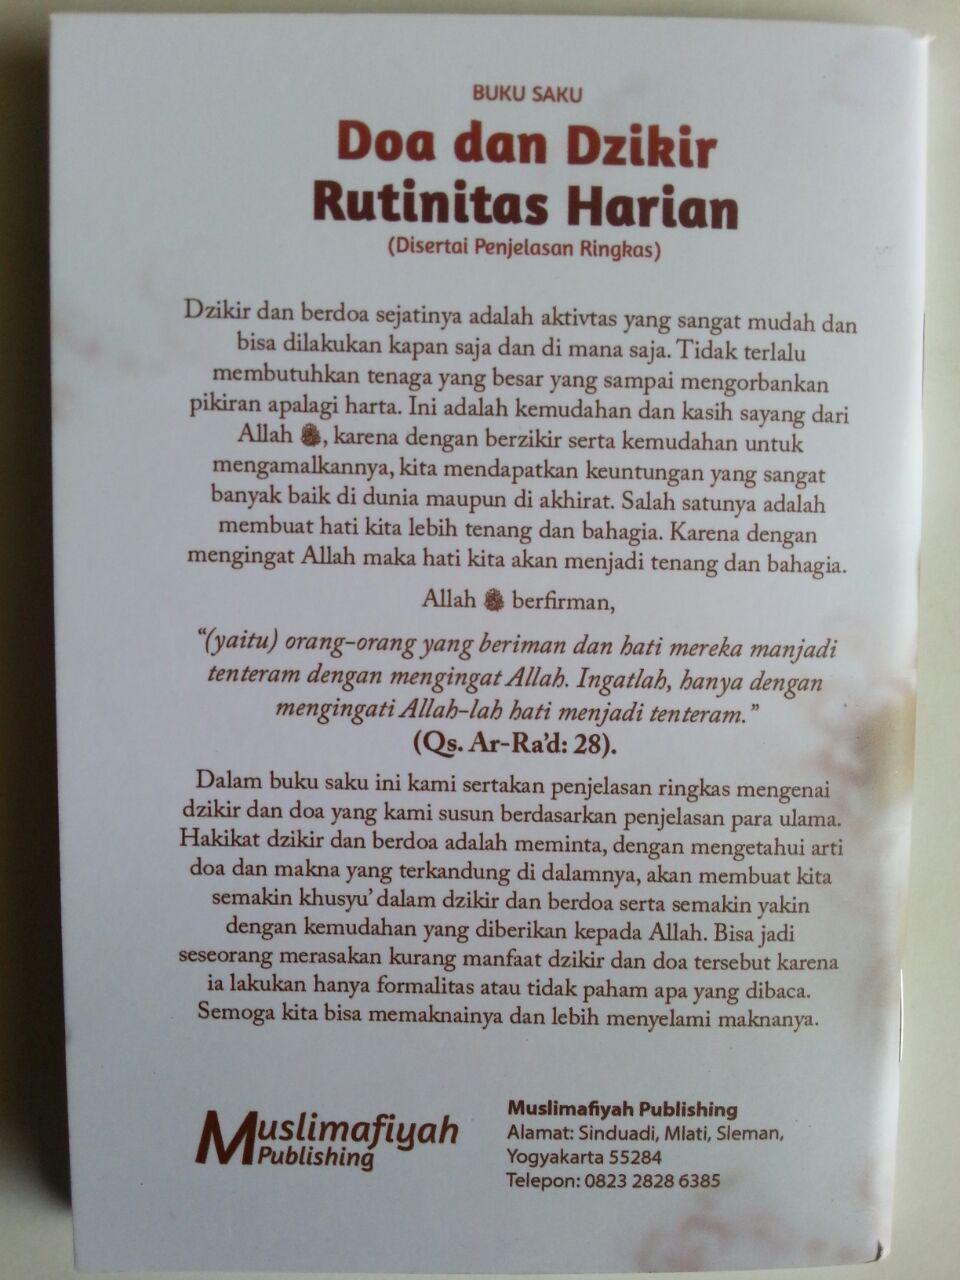 Buku Saku Doa Dan Dzikir Rutinitas Harian Disertai Penjelasan Ringkas cover